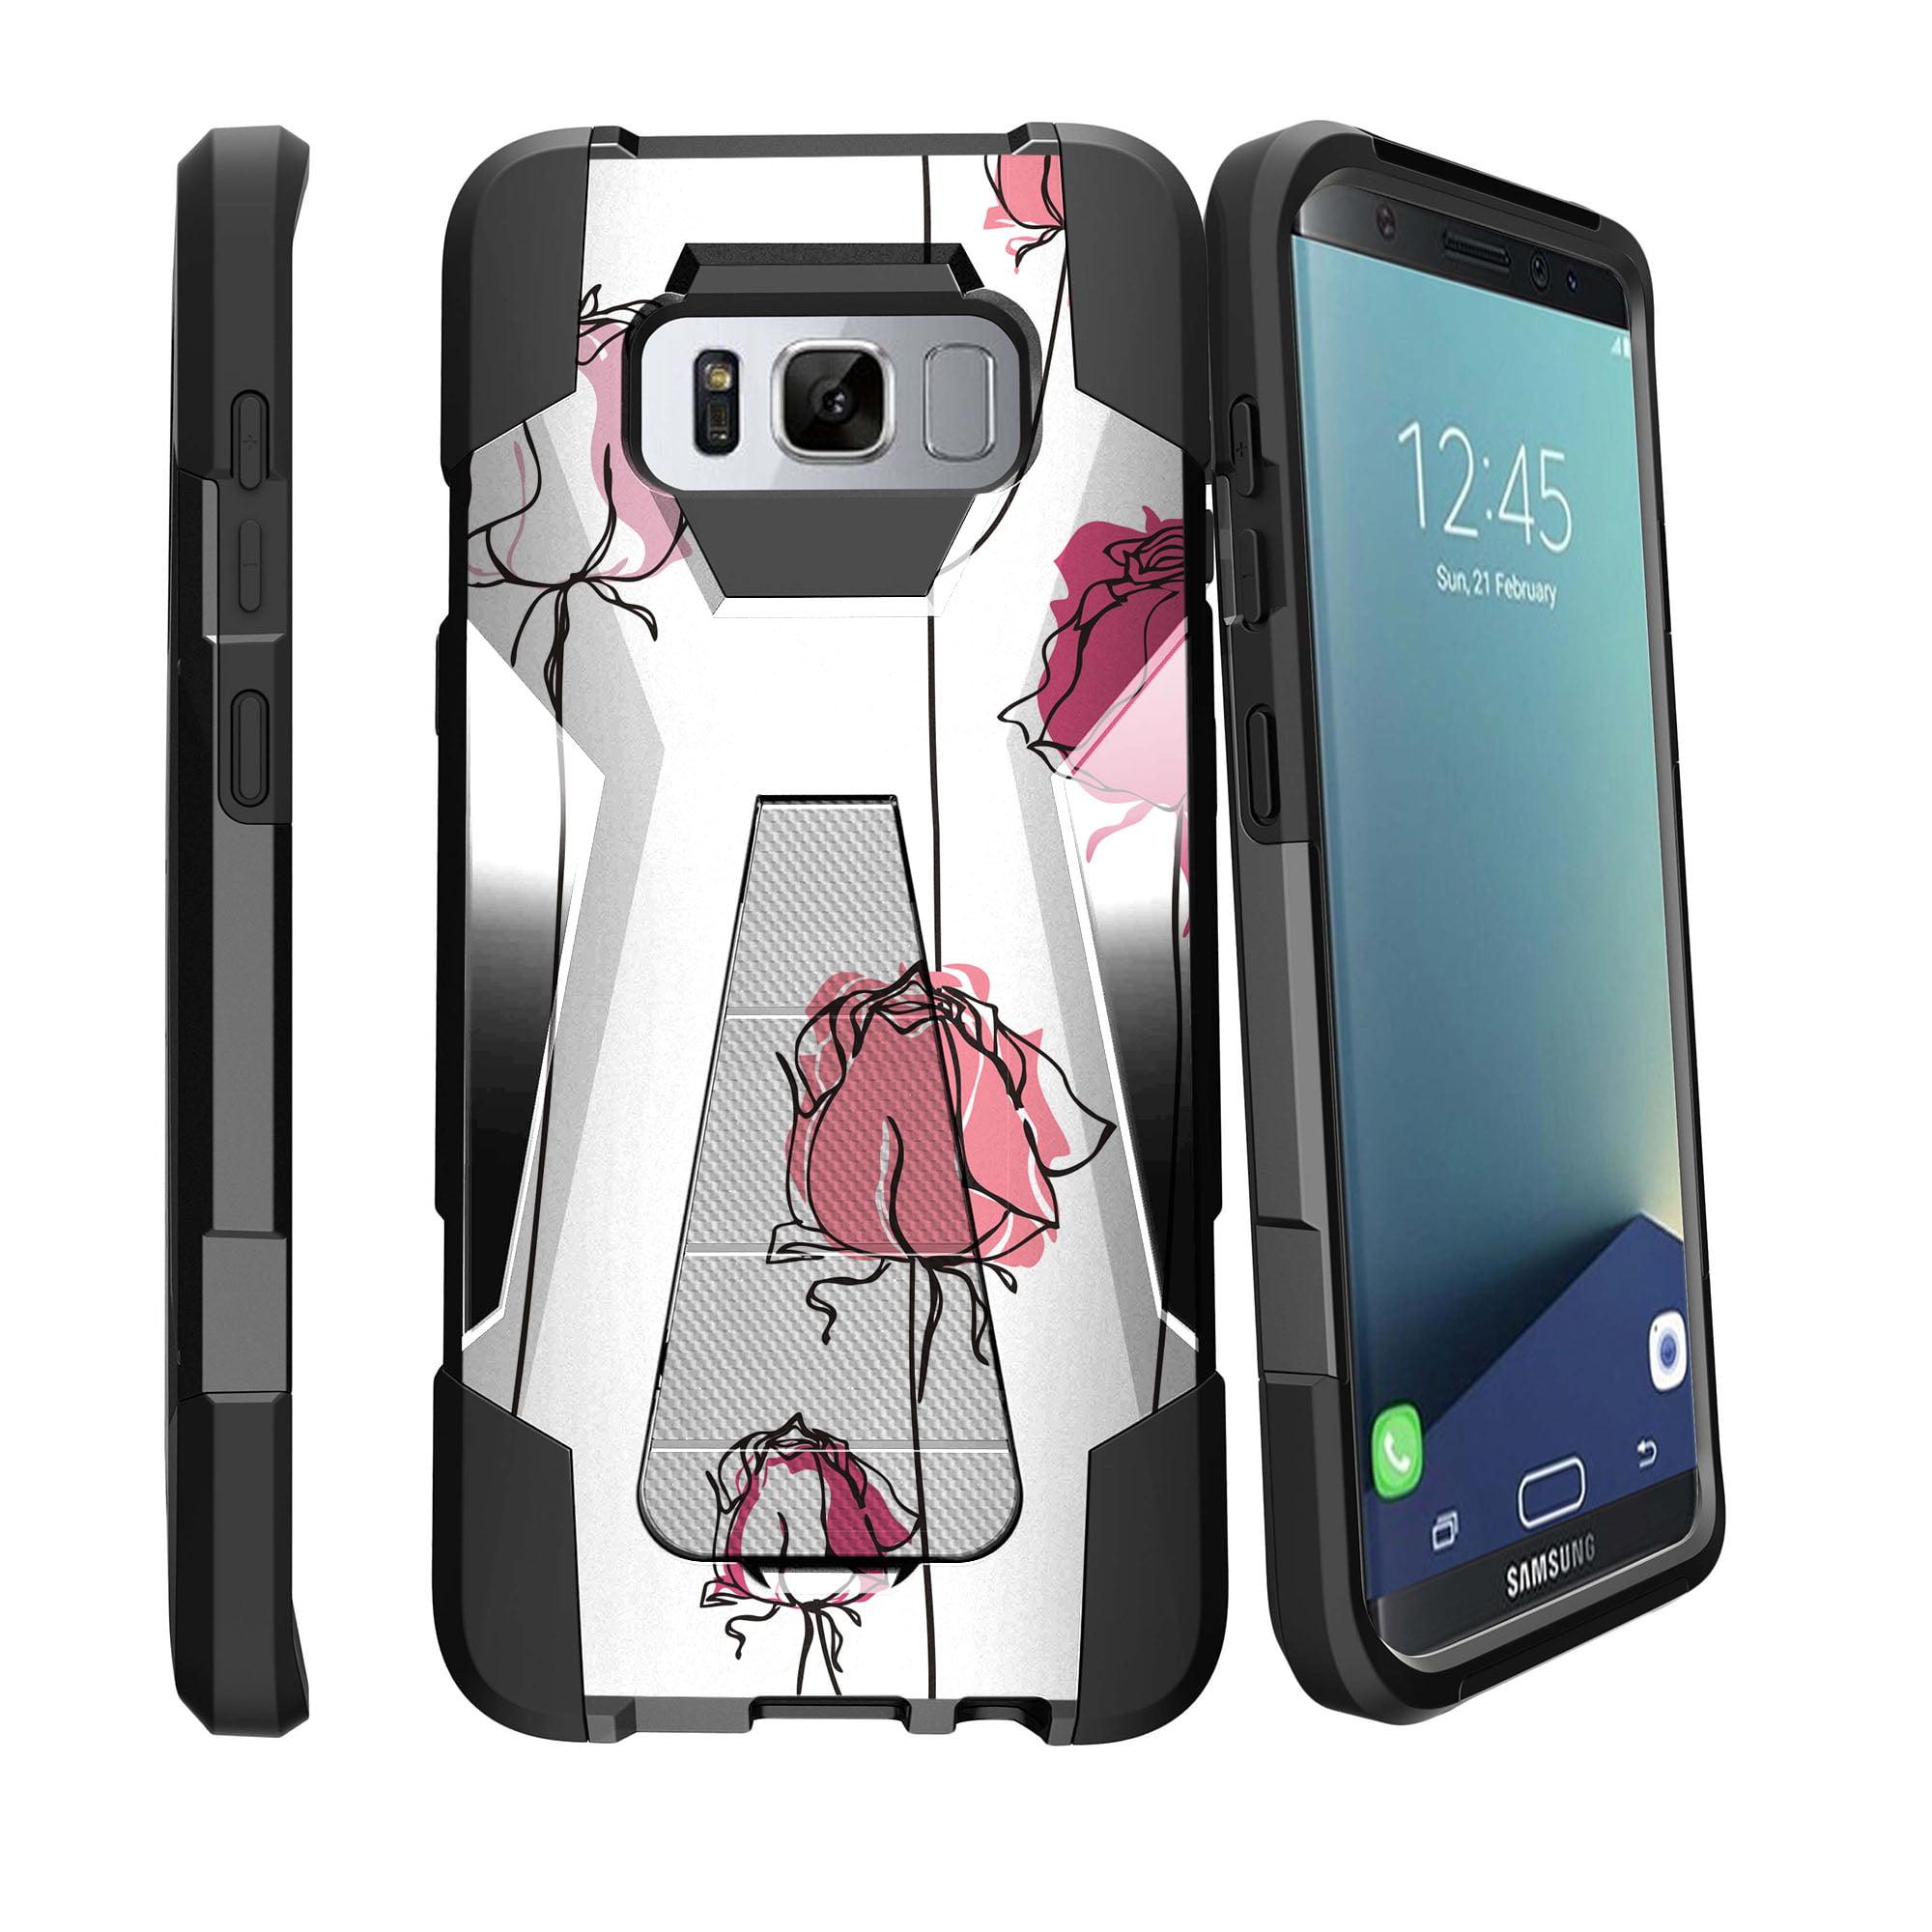 Case for Samsung Galaxy S8 PLUS version | S8 PLUS version Hybrid Case [ Shock Fusion ] Hybrid Layers and Kickstand Case Flower Collection